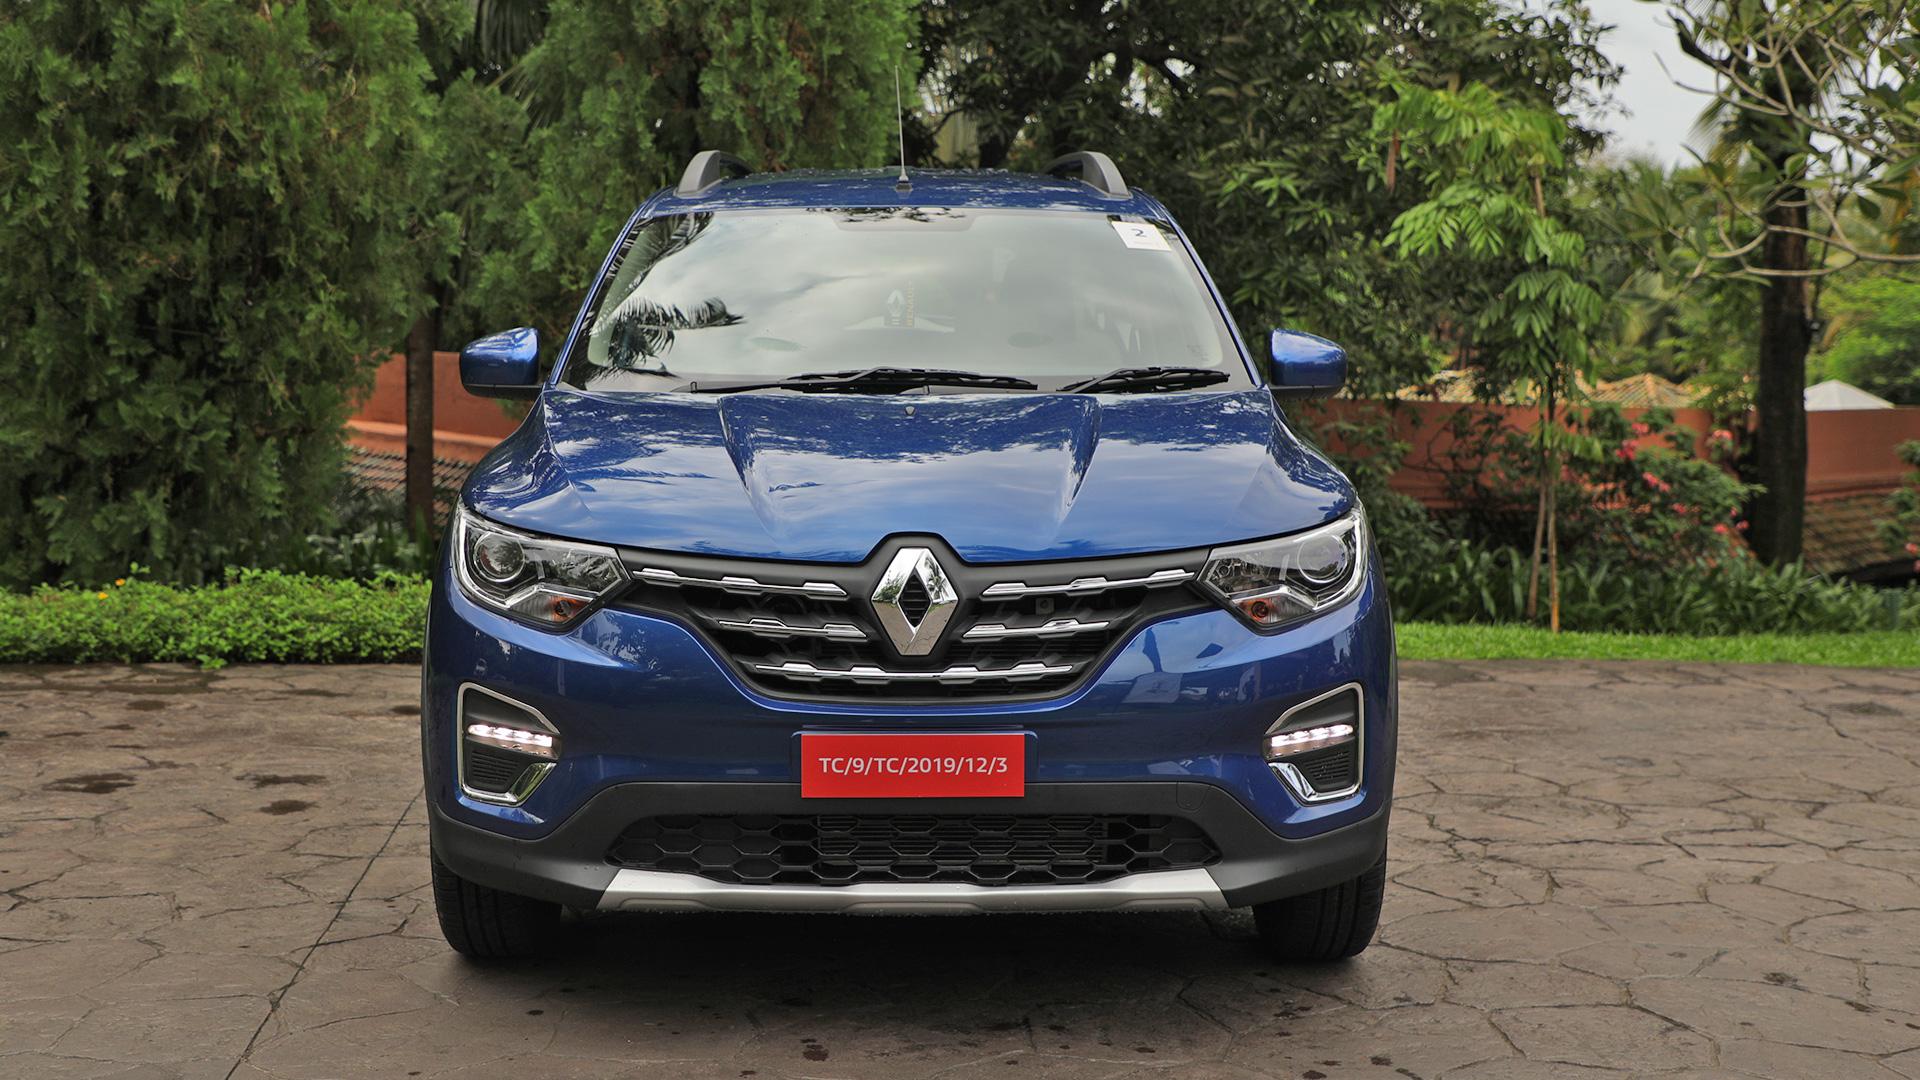 Renault Triber 2019 RXL Exterior